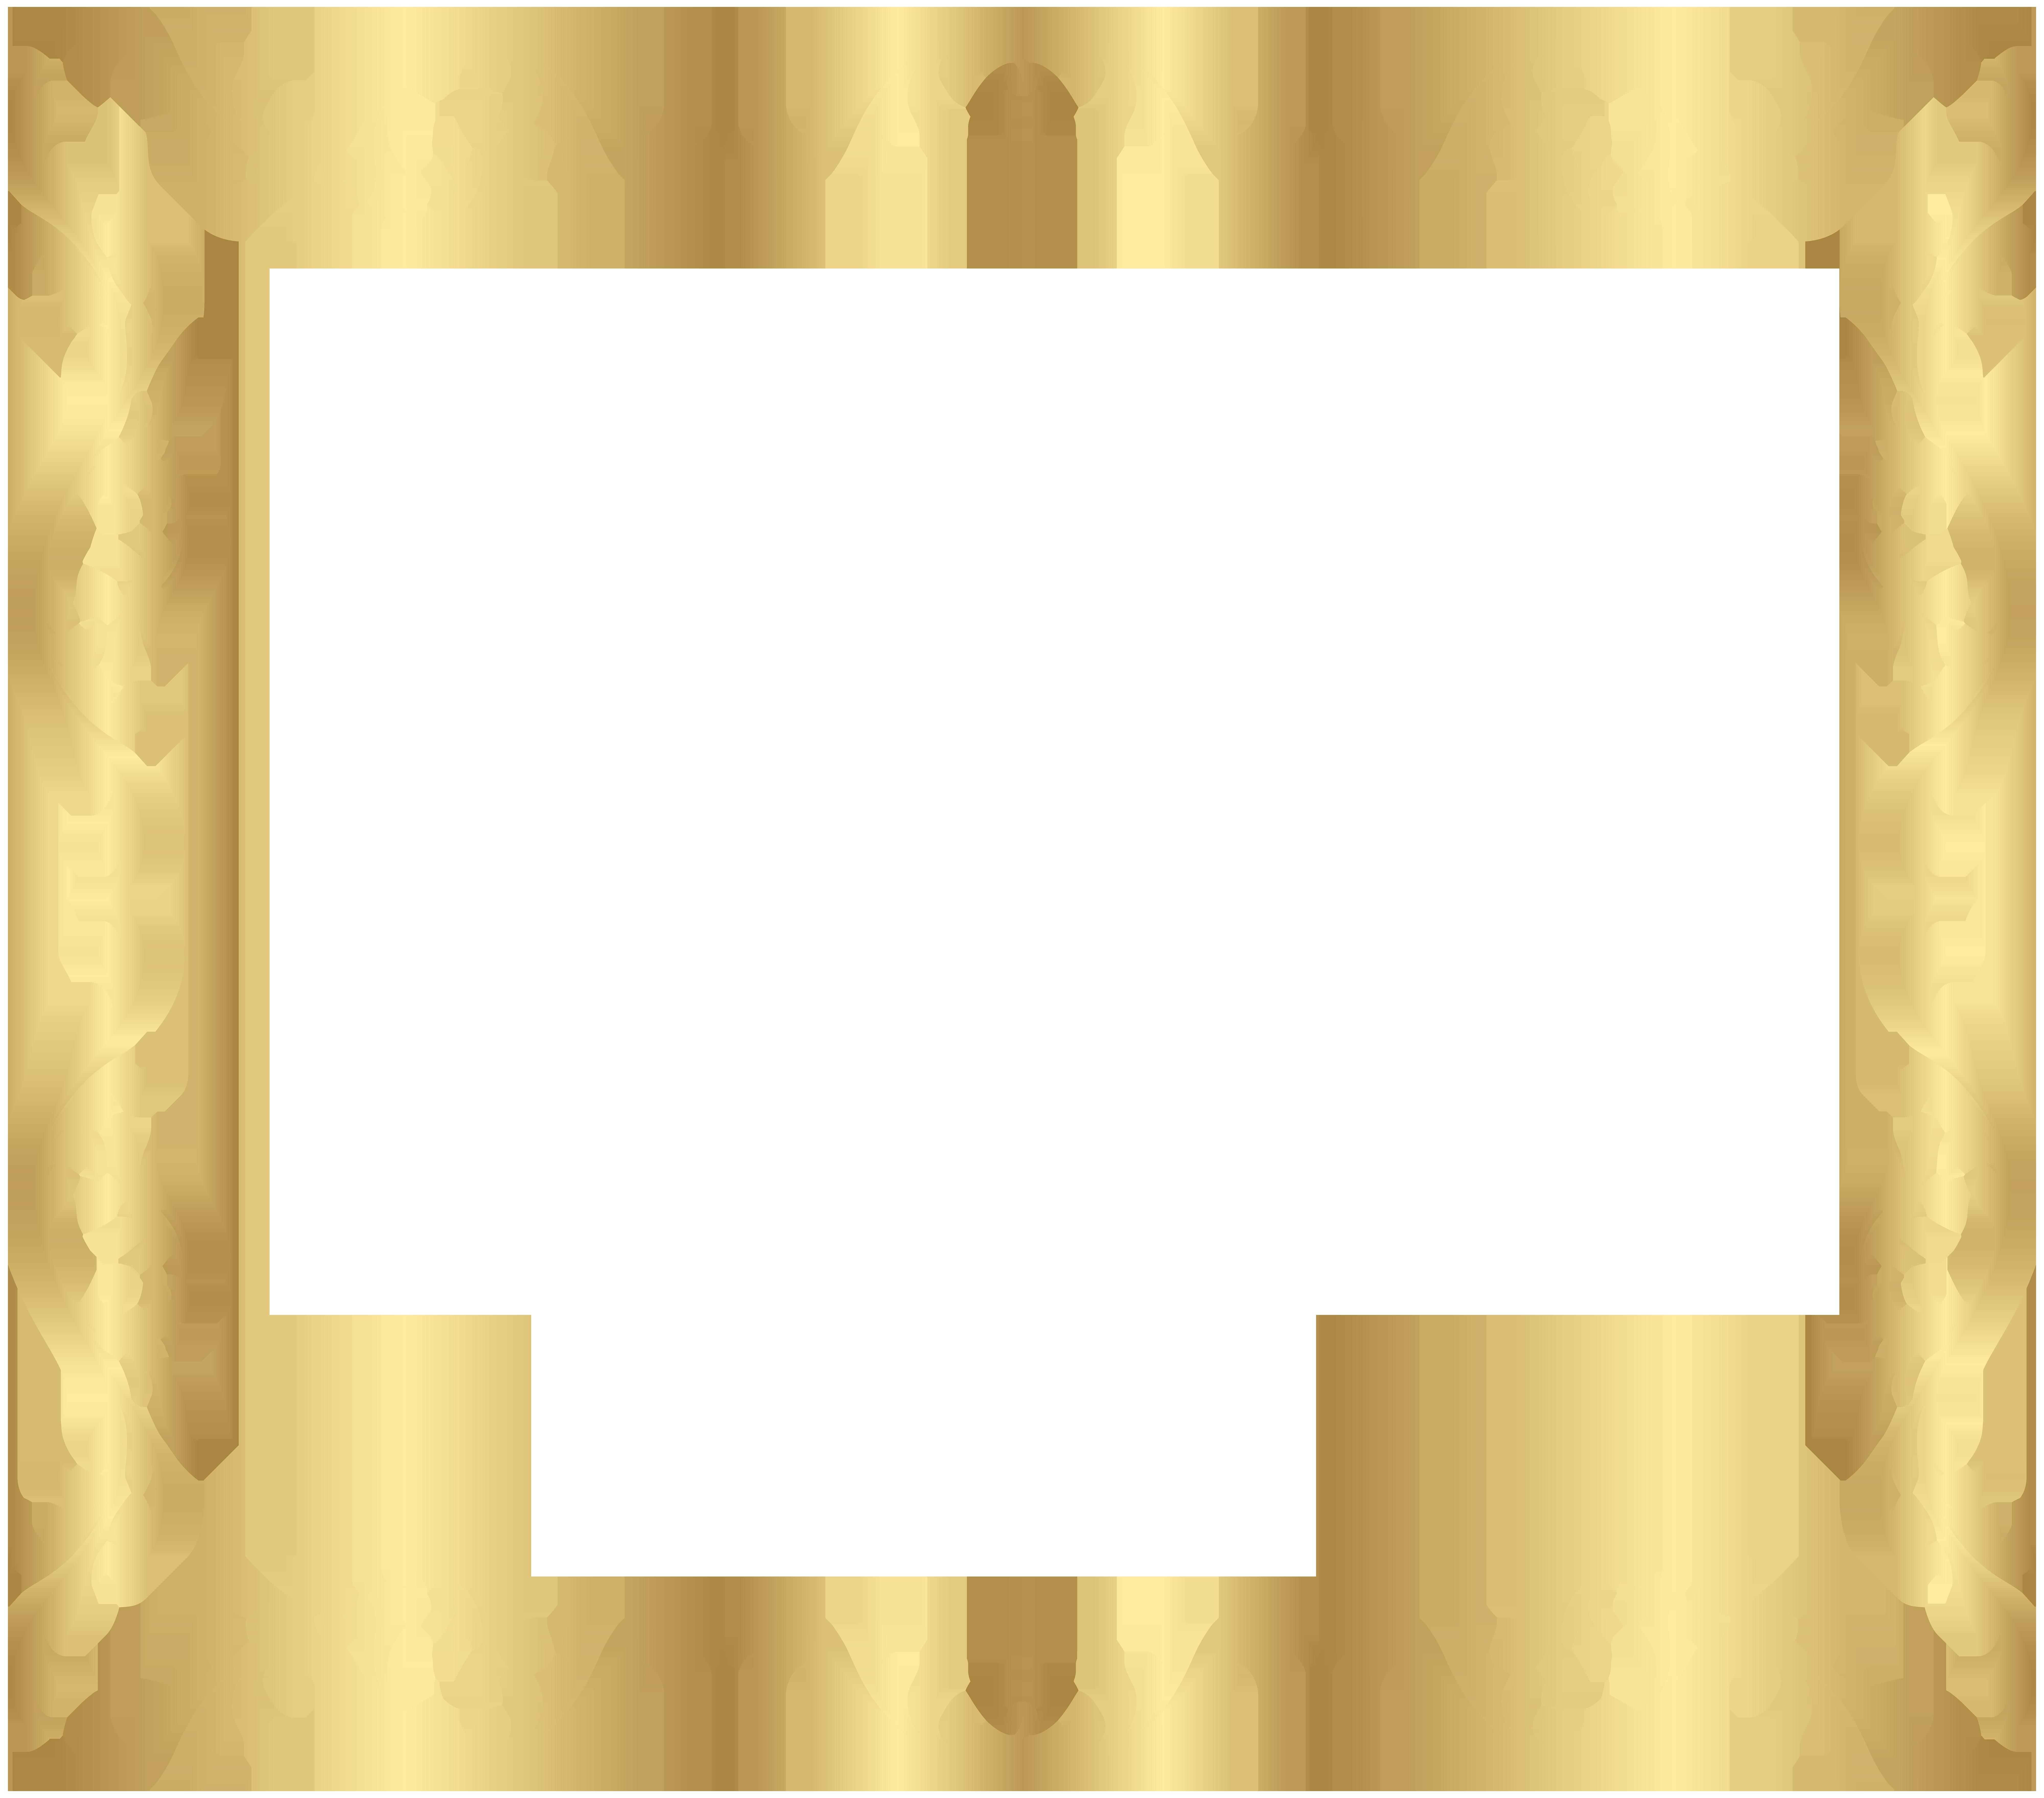 Frame gold transparent clip. Watermelon clipart border